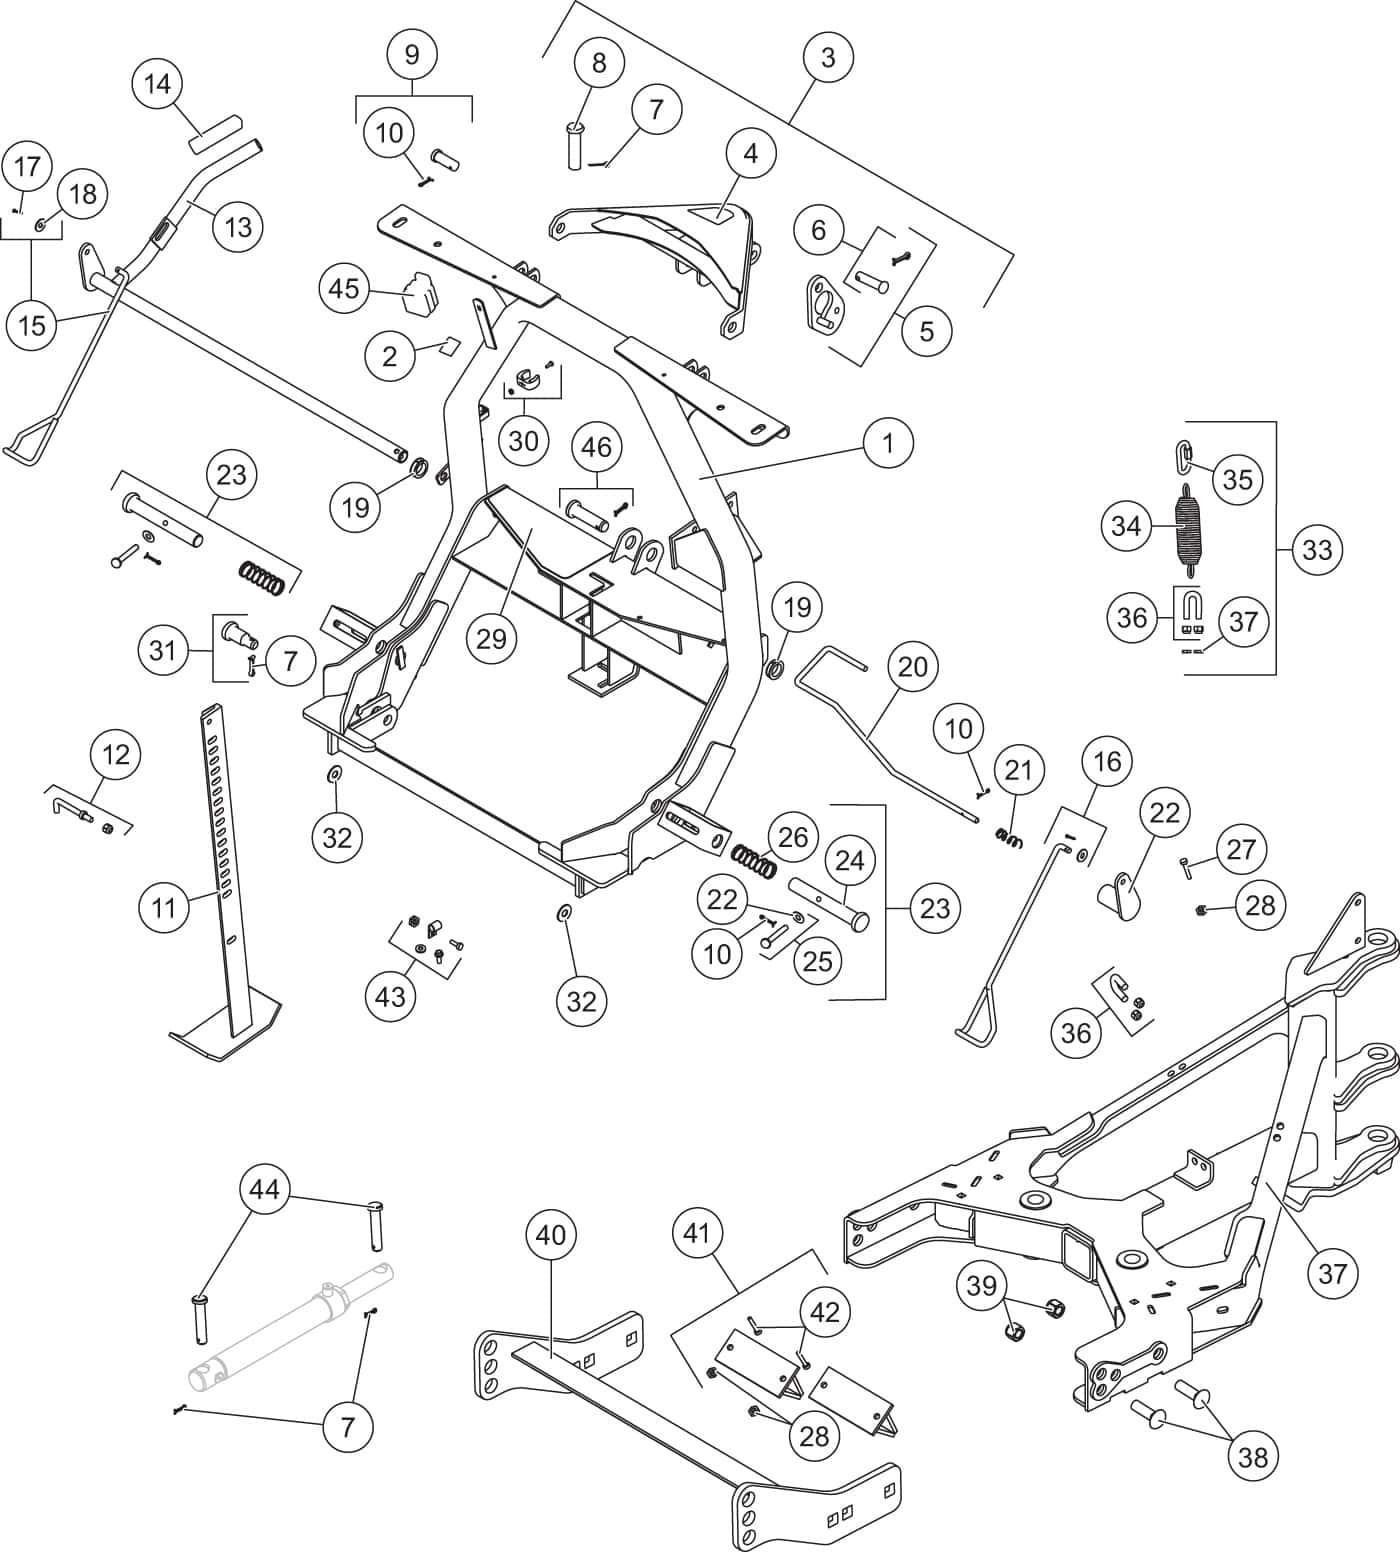 Fisher Plow Wiring Diagram Minute Mount 2 - Schema Wiring Diagram Online - Fisher Plow Wiring Diagram Minute Mount 2